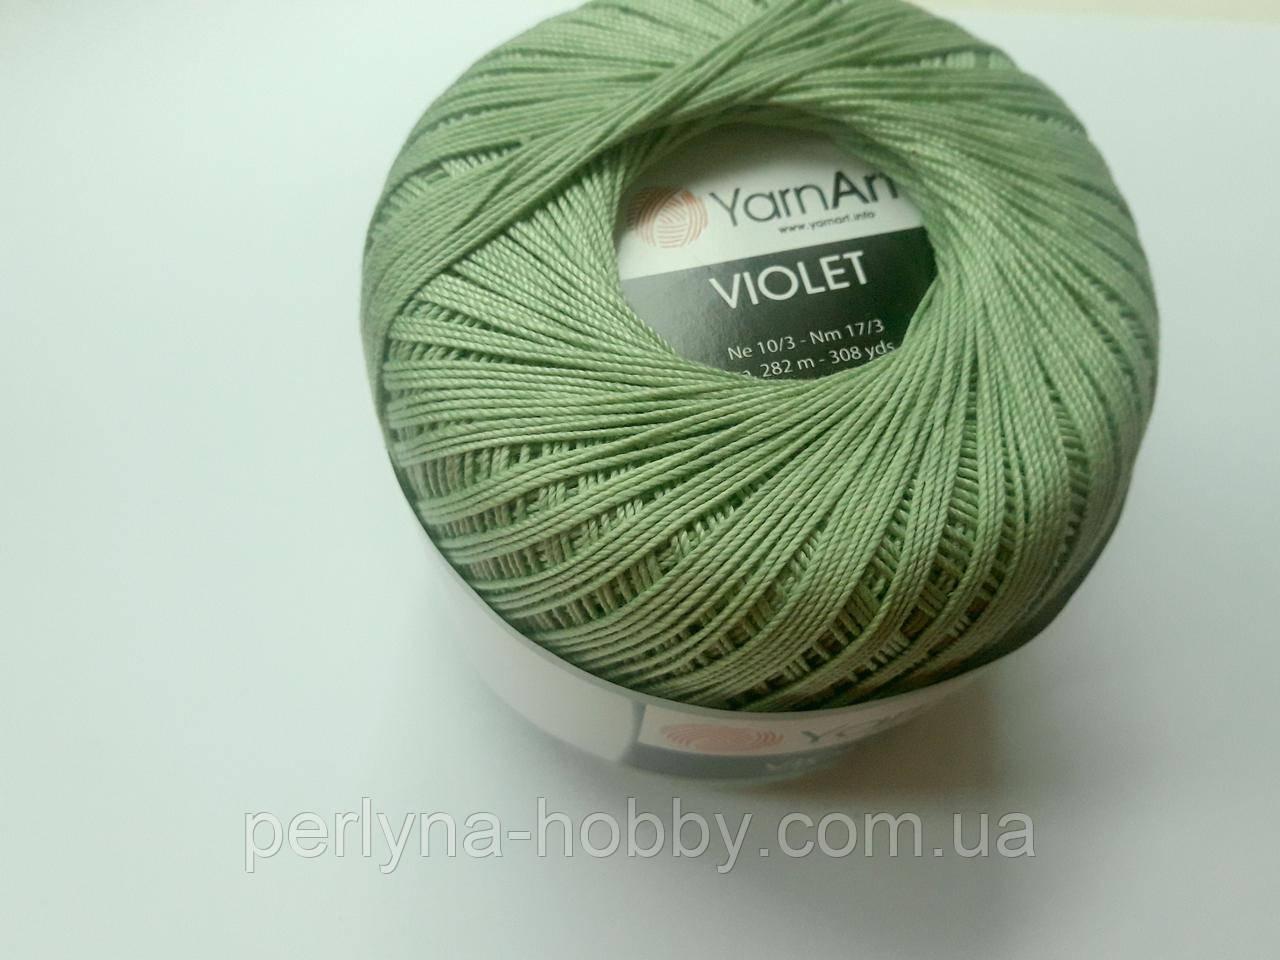 Пряжа Violet YarnArt 100% бавовна зелений пастельний № 6369